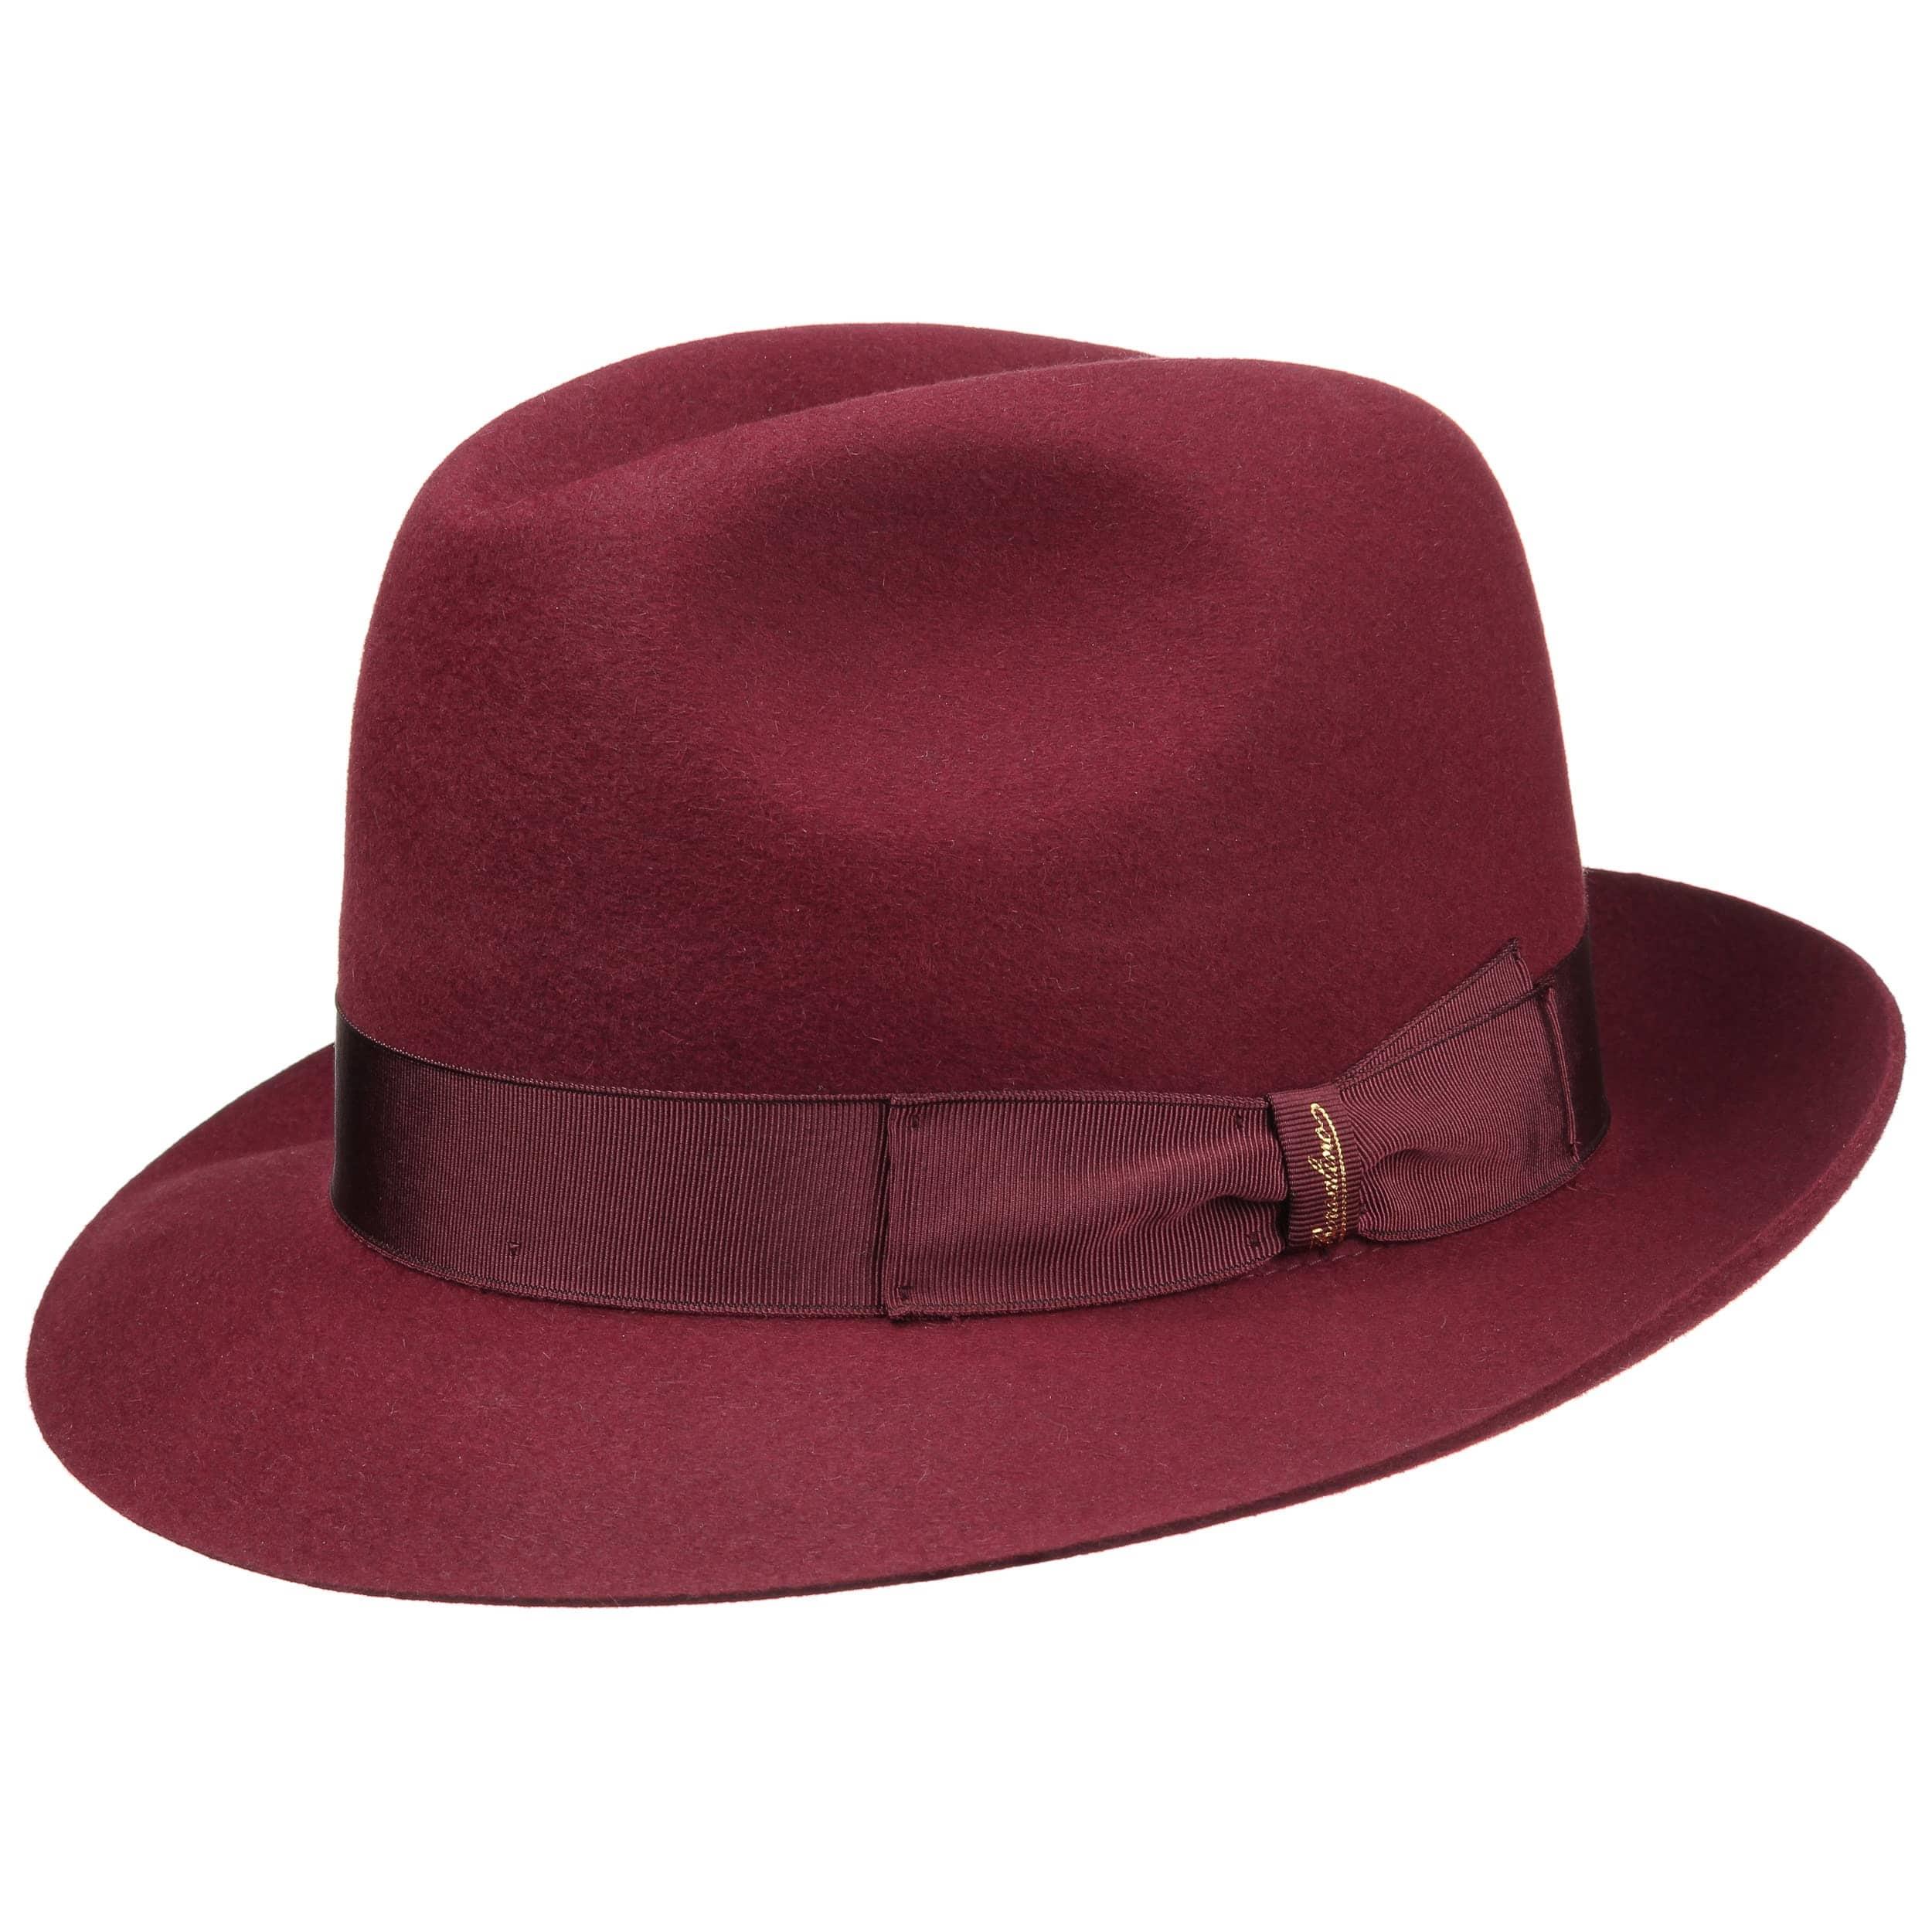 Sombrero Fieltro Pelo Georgio by Borsalino - Sombreros - sombreroshop.es a658415d4a4